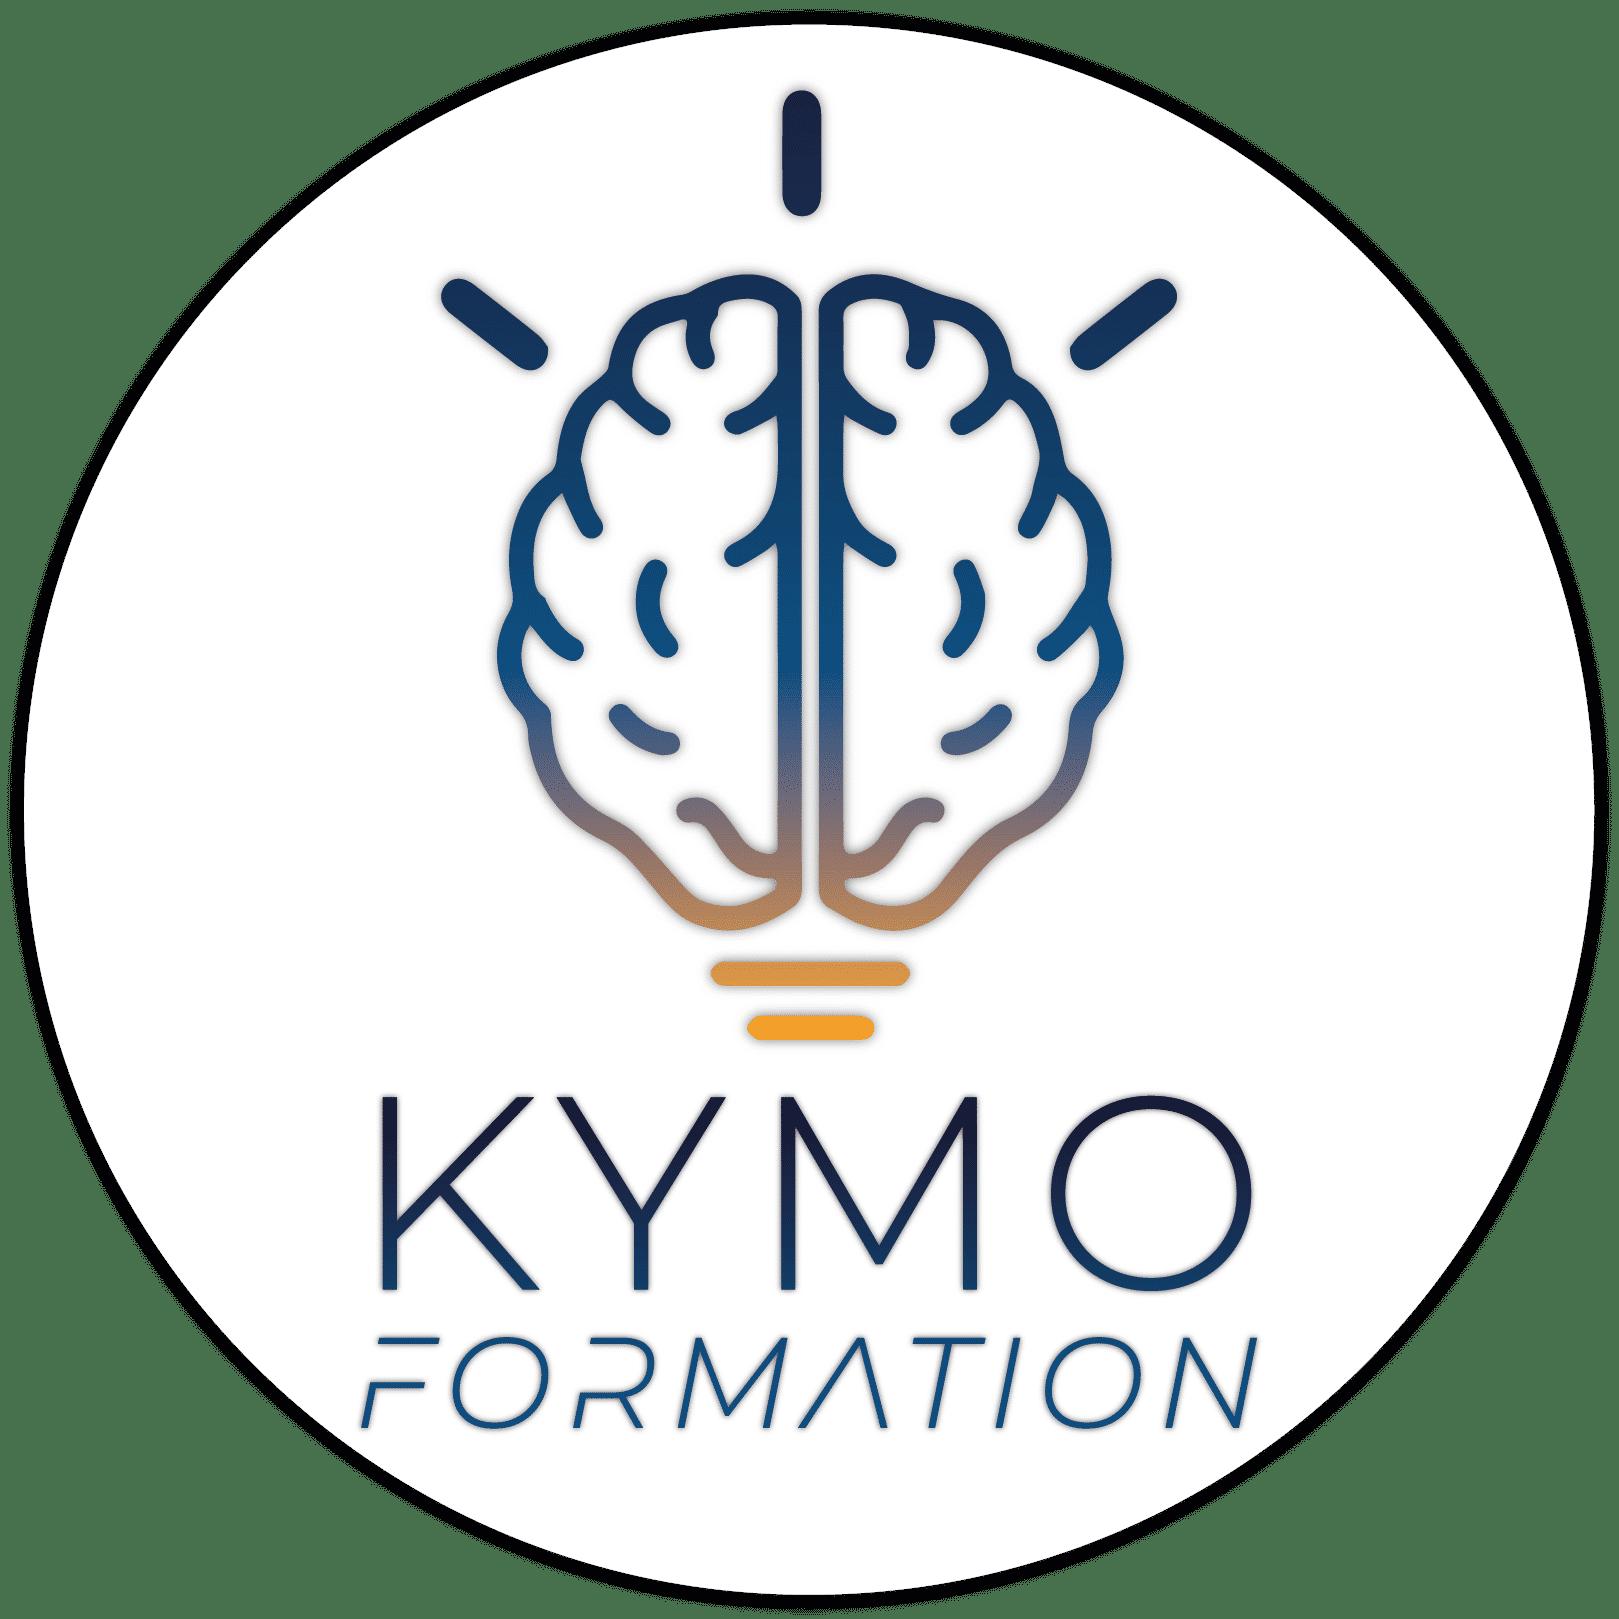 KYMO Formation